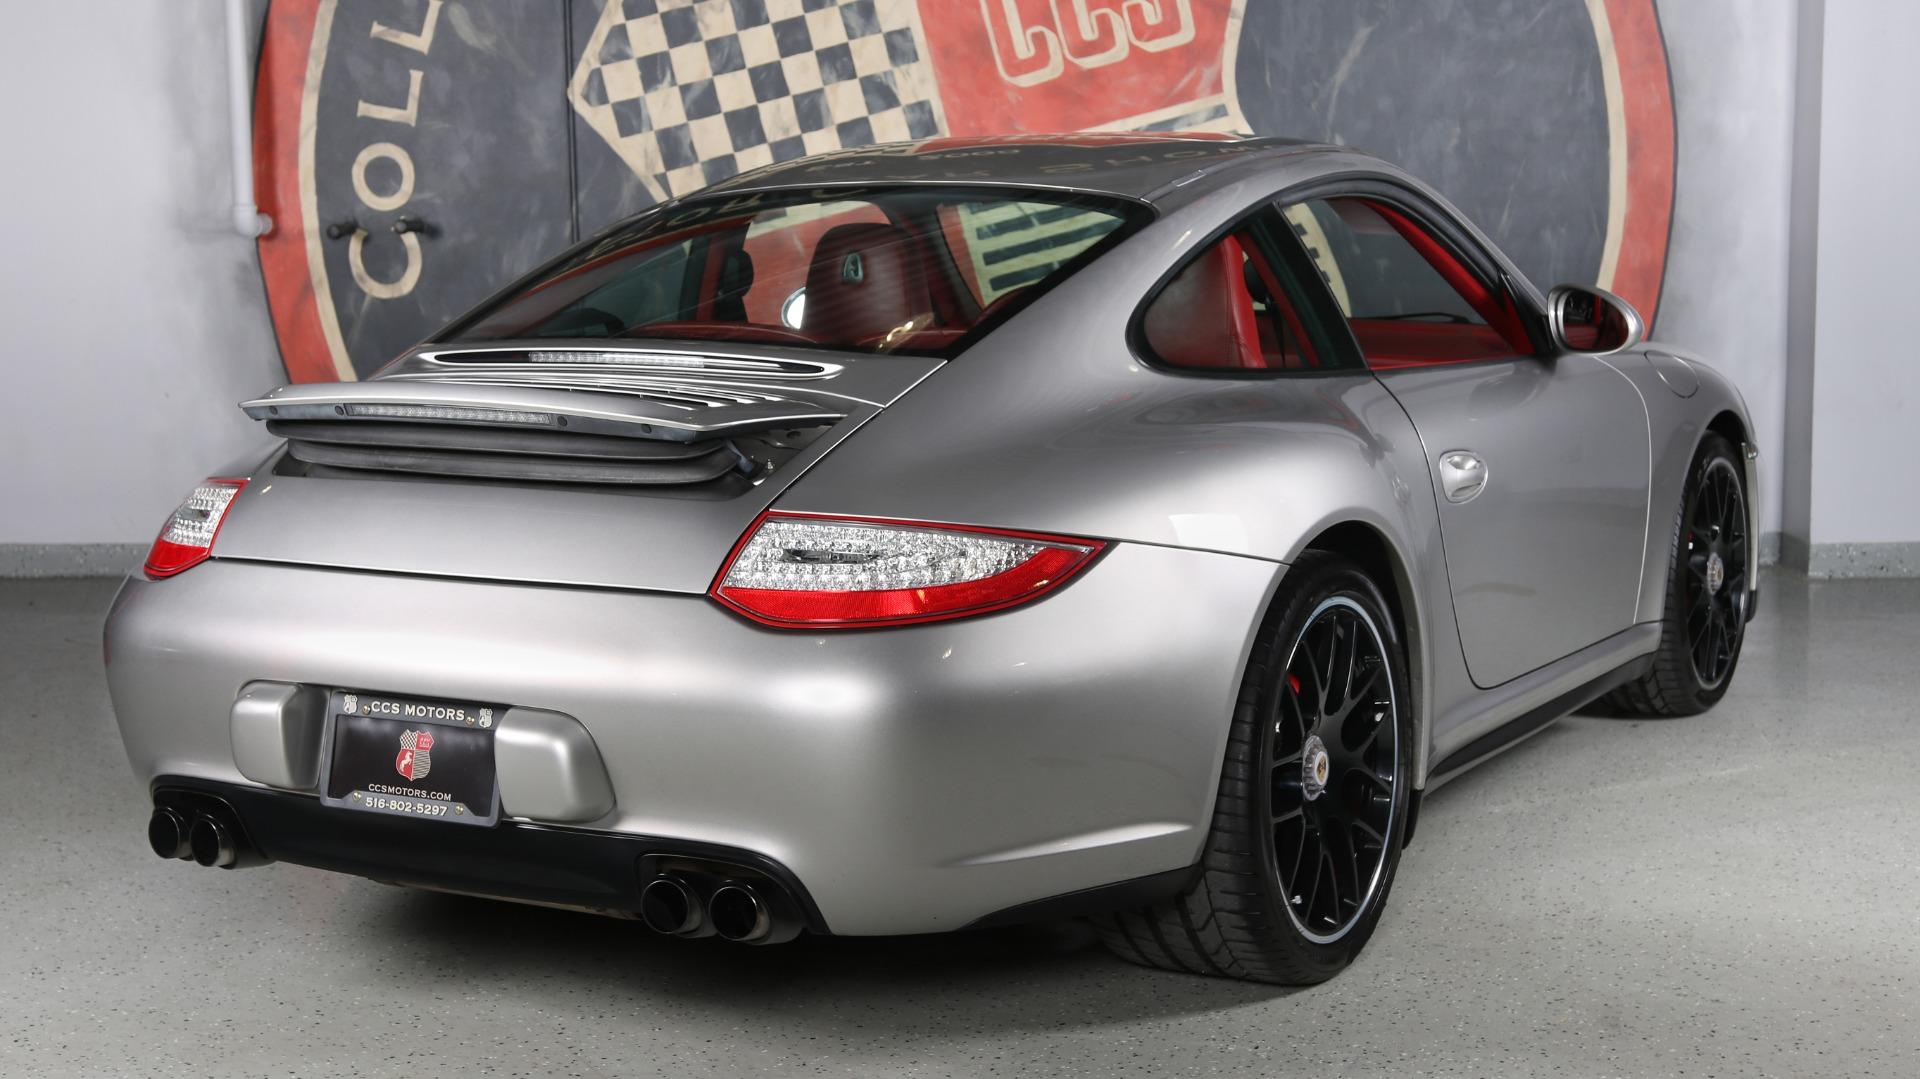 2012 Porsche 911 Carrera Gts Coupe Stock 1304 For Sale